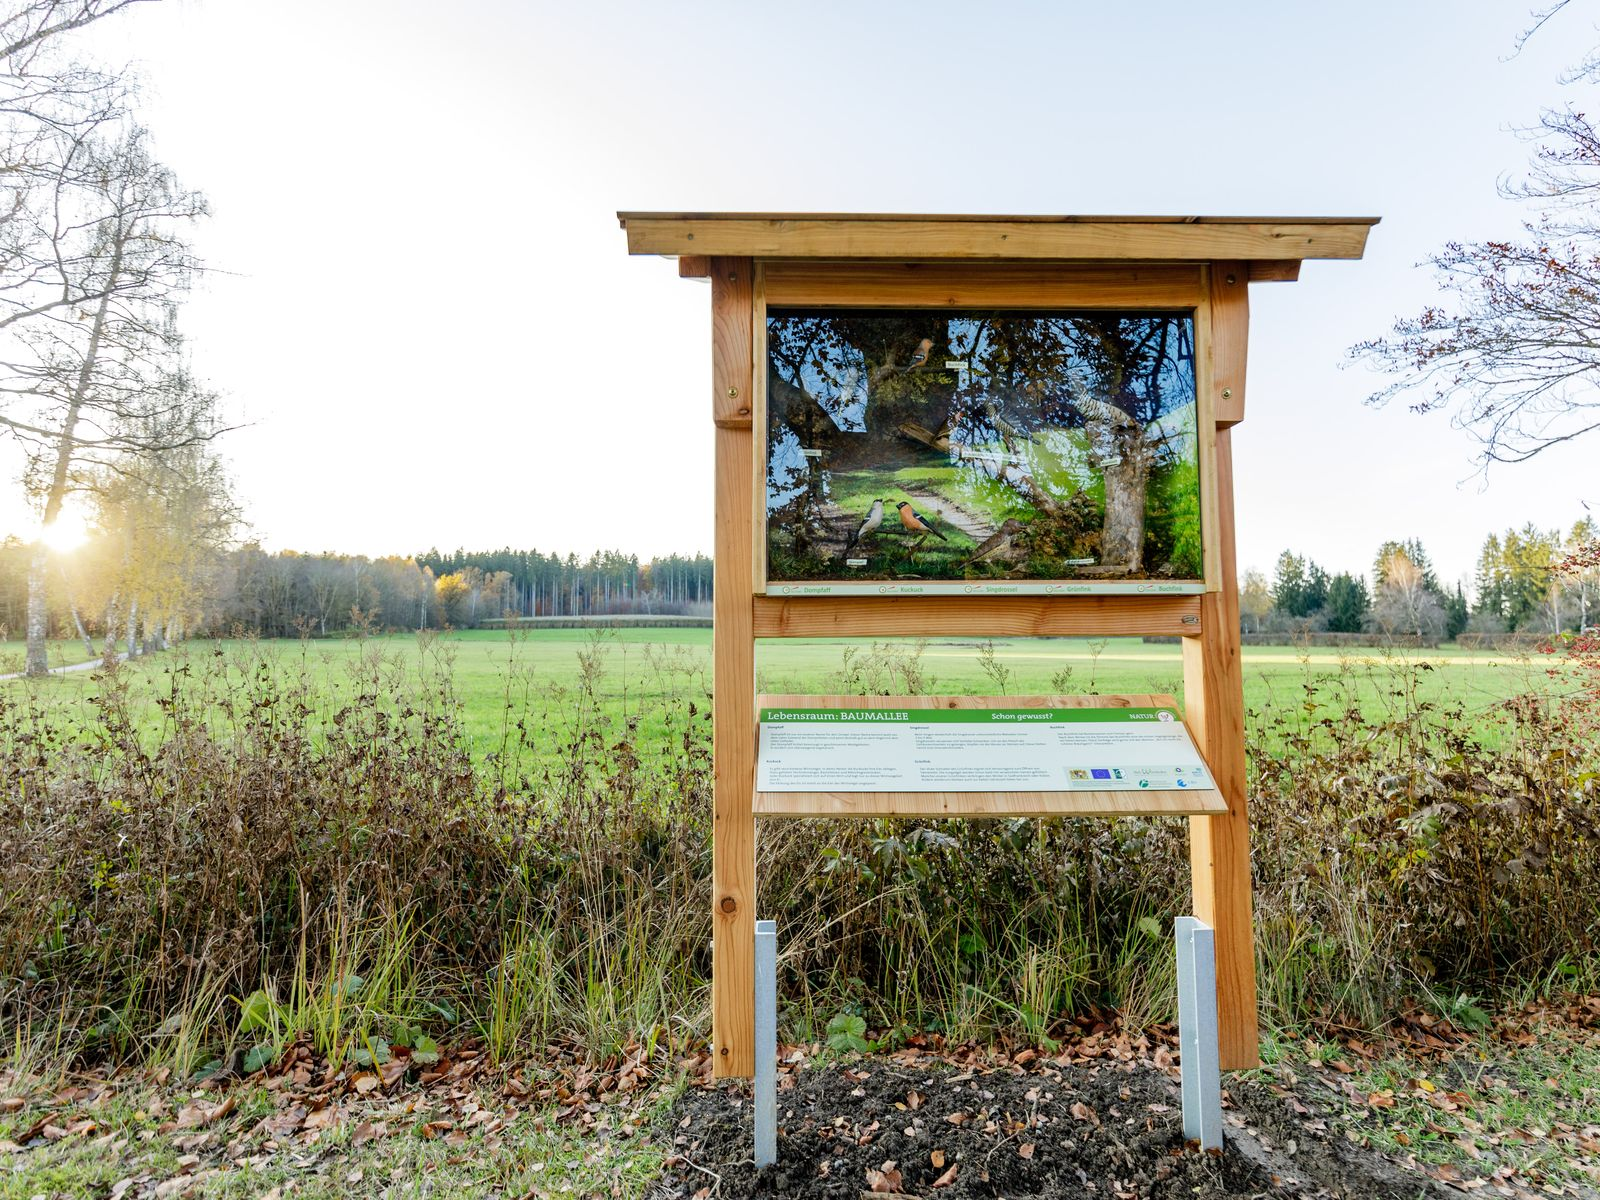 "Naturerlebnisroute ""Buntspecht & Co"" - Station Vogelschaukasten Baumallee"